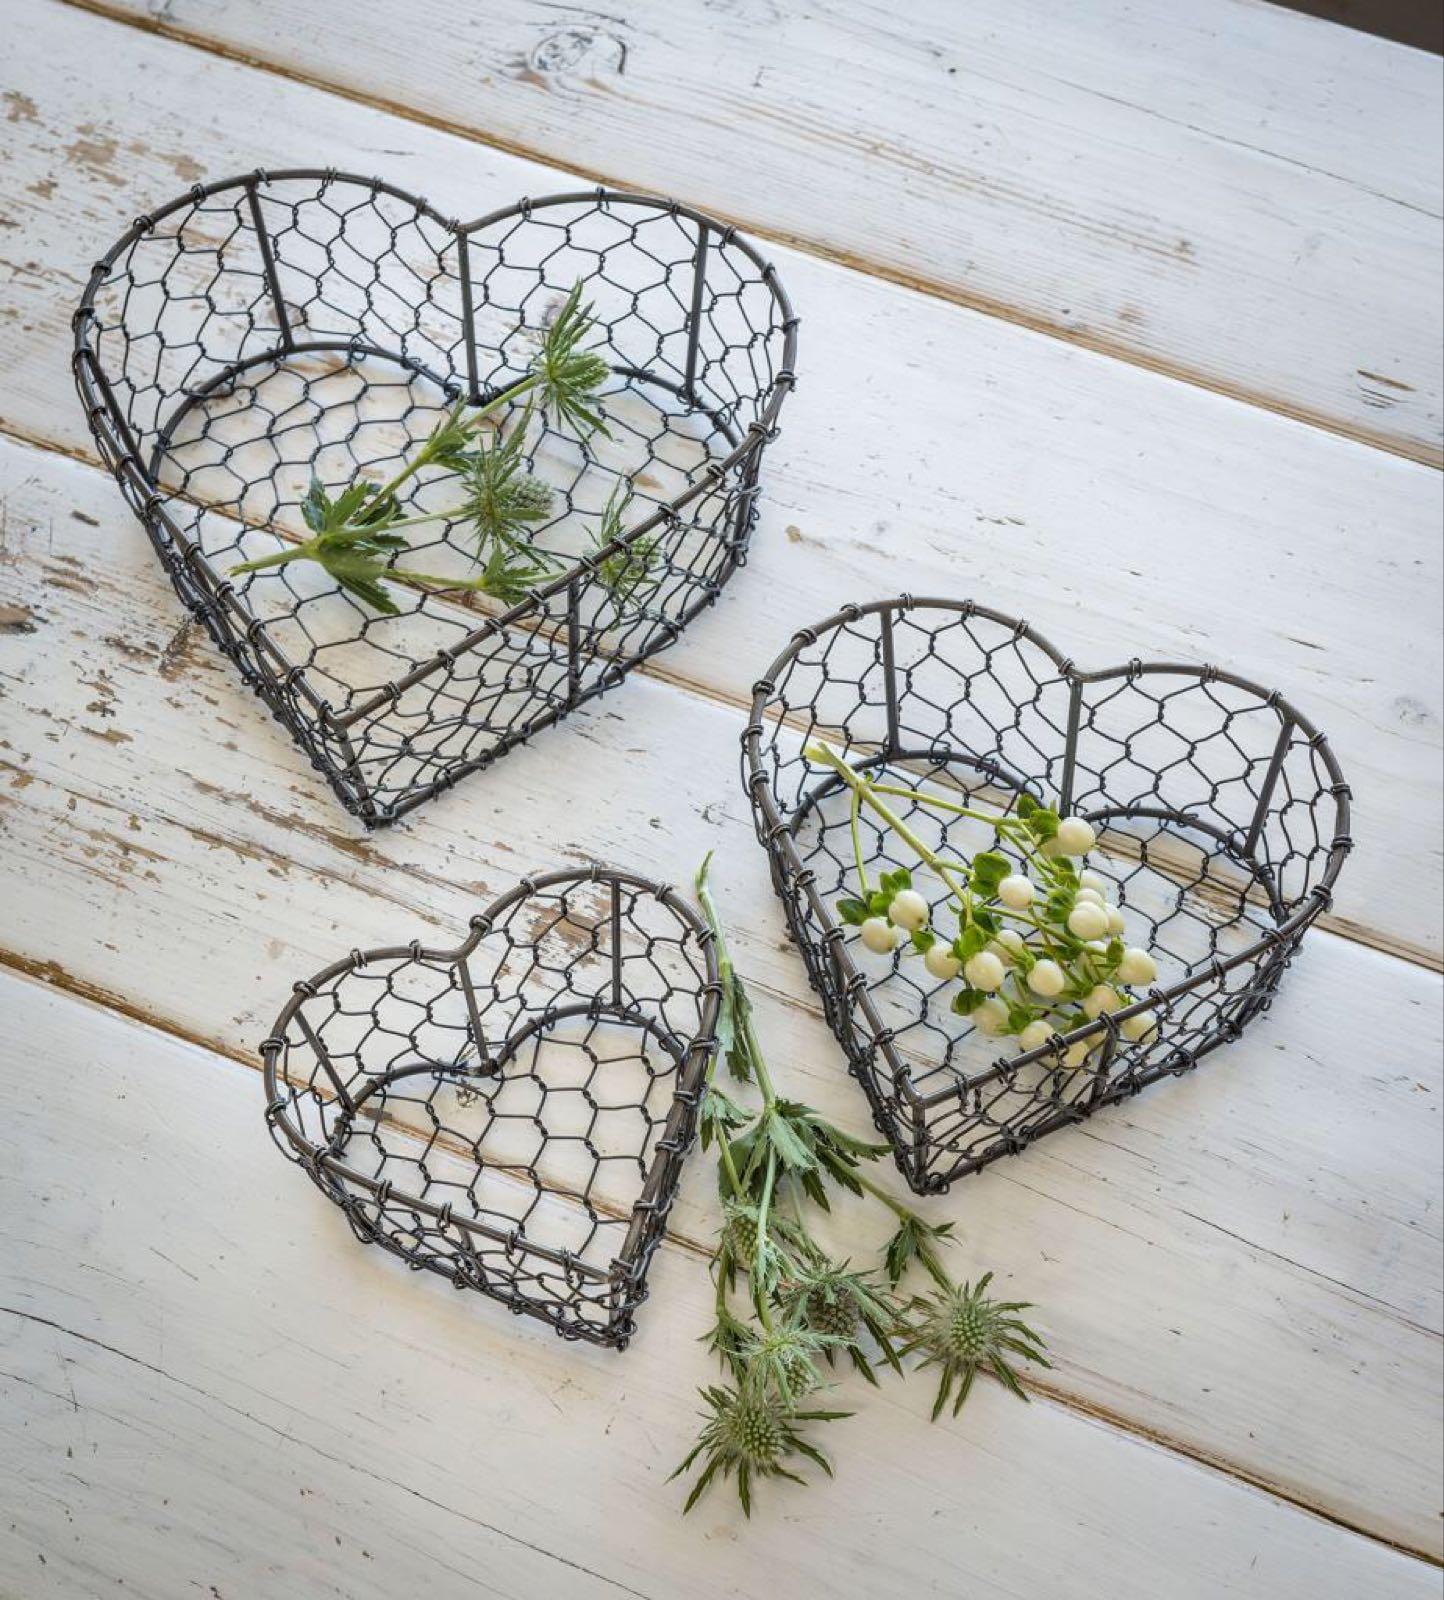 Heart wire Baskets